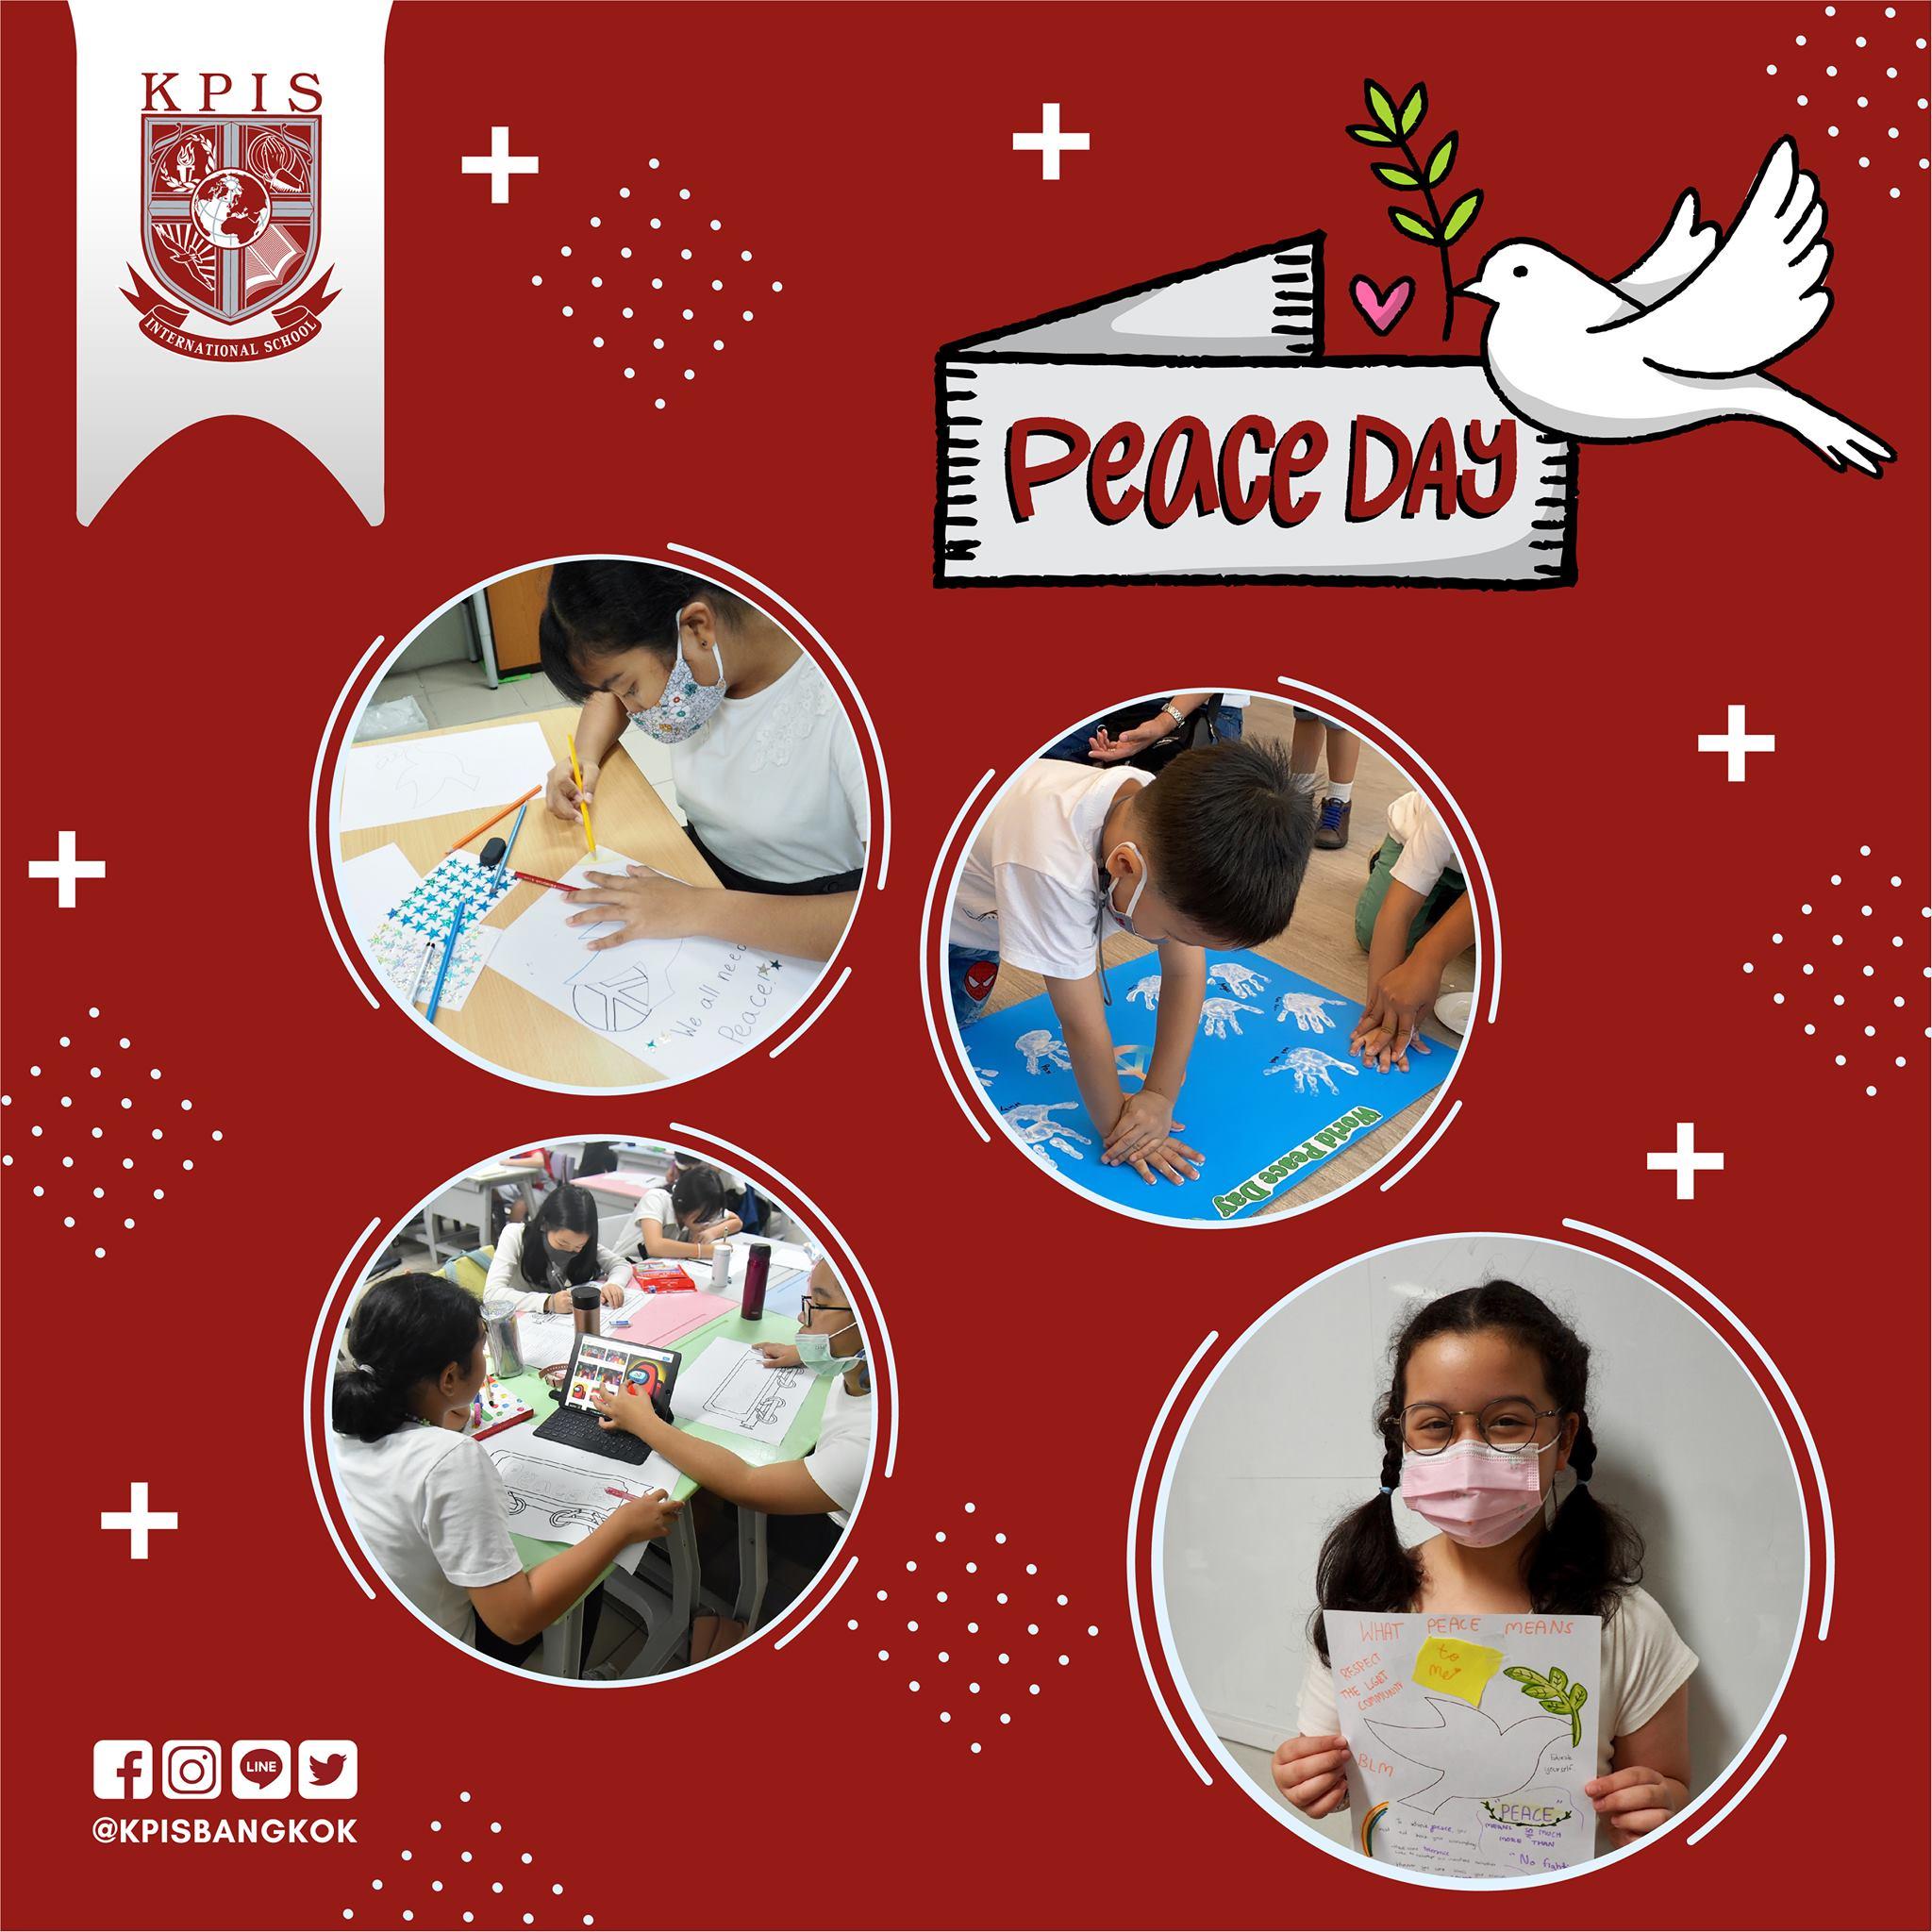 Happy Peace Day